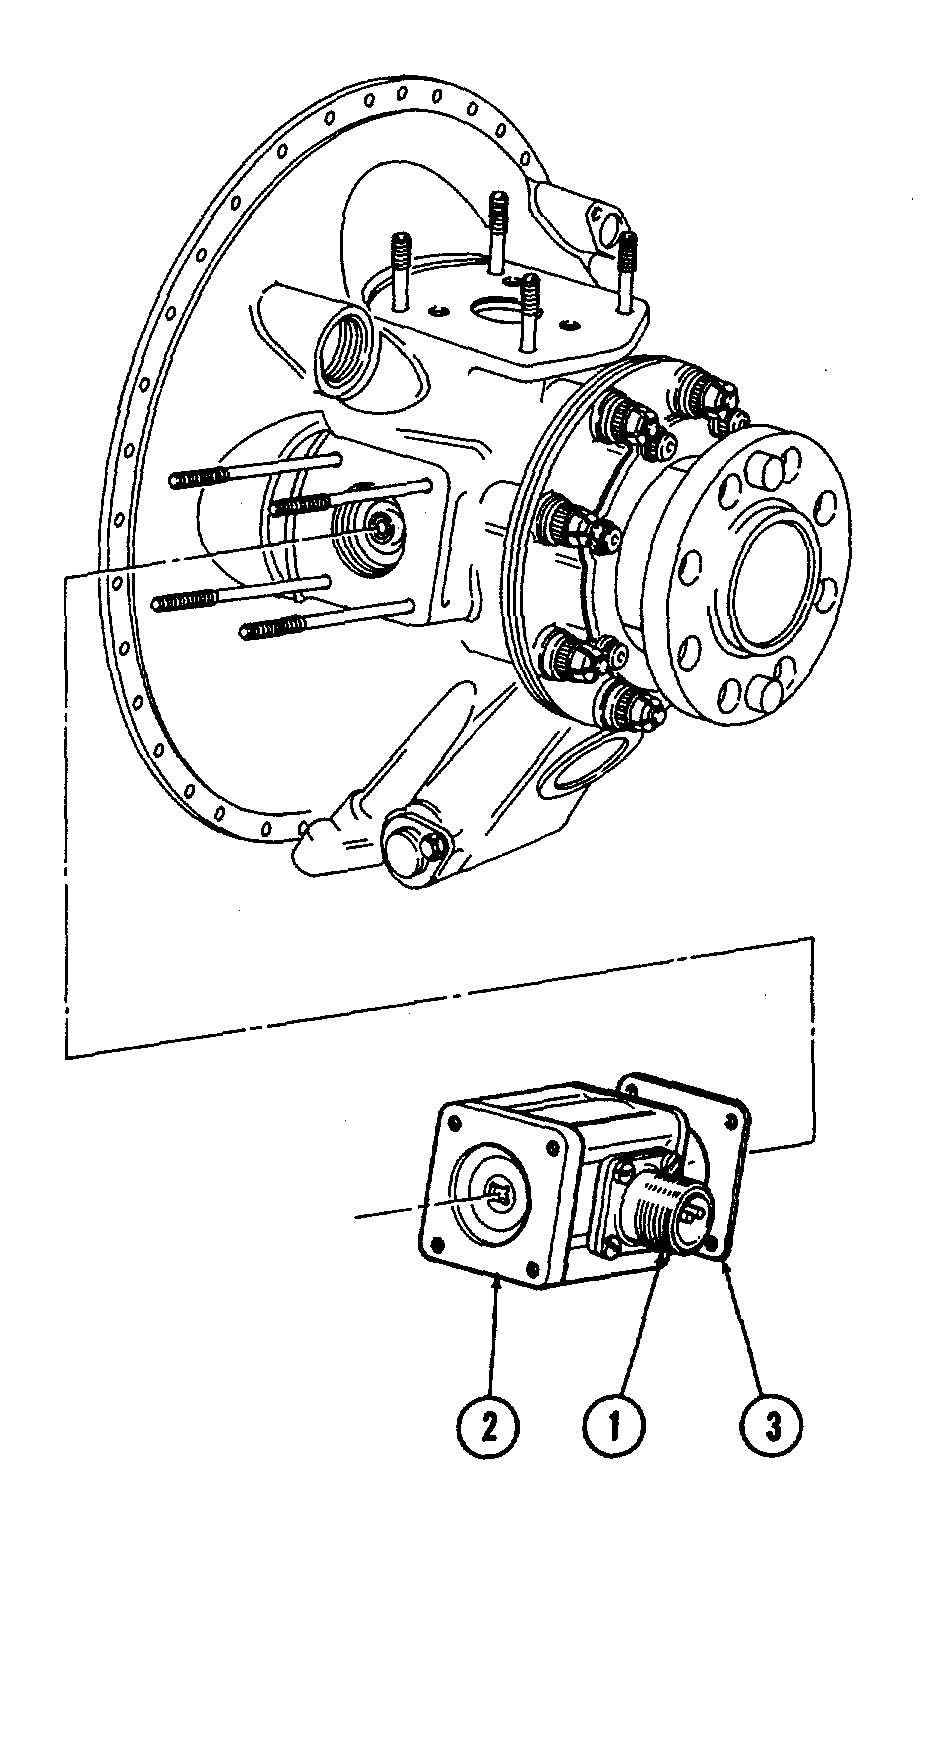 Nf Tachometer Generator Peltor Wiring Diagram